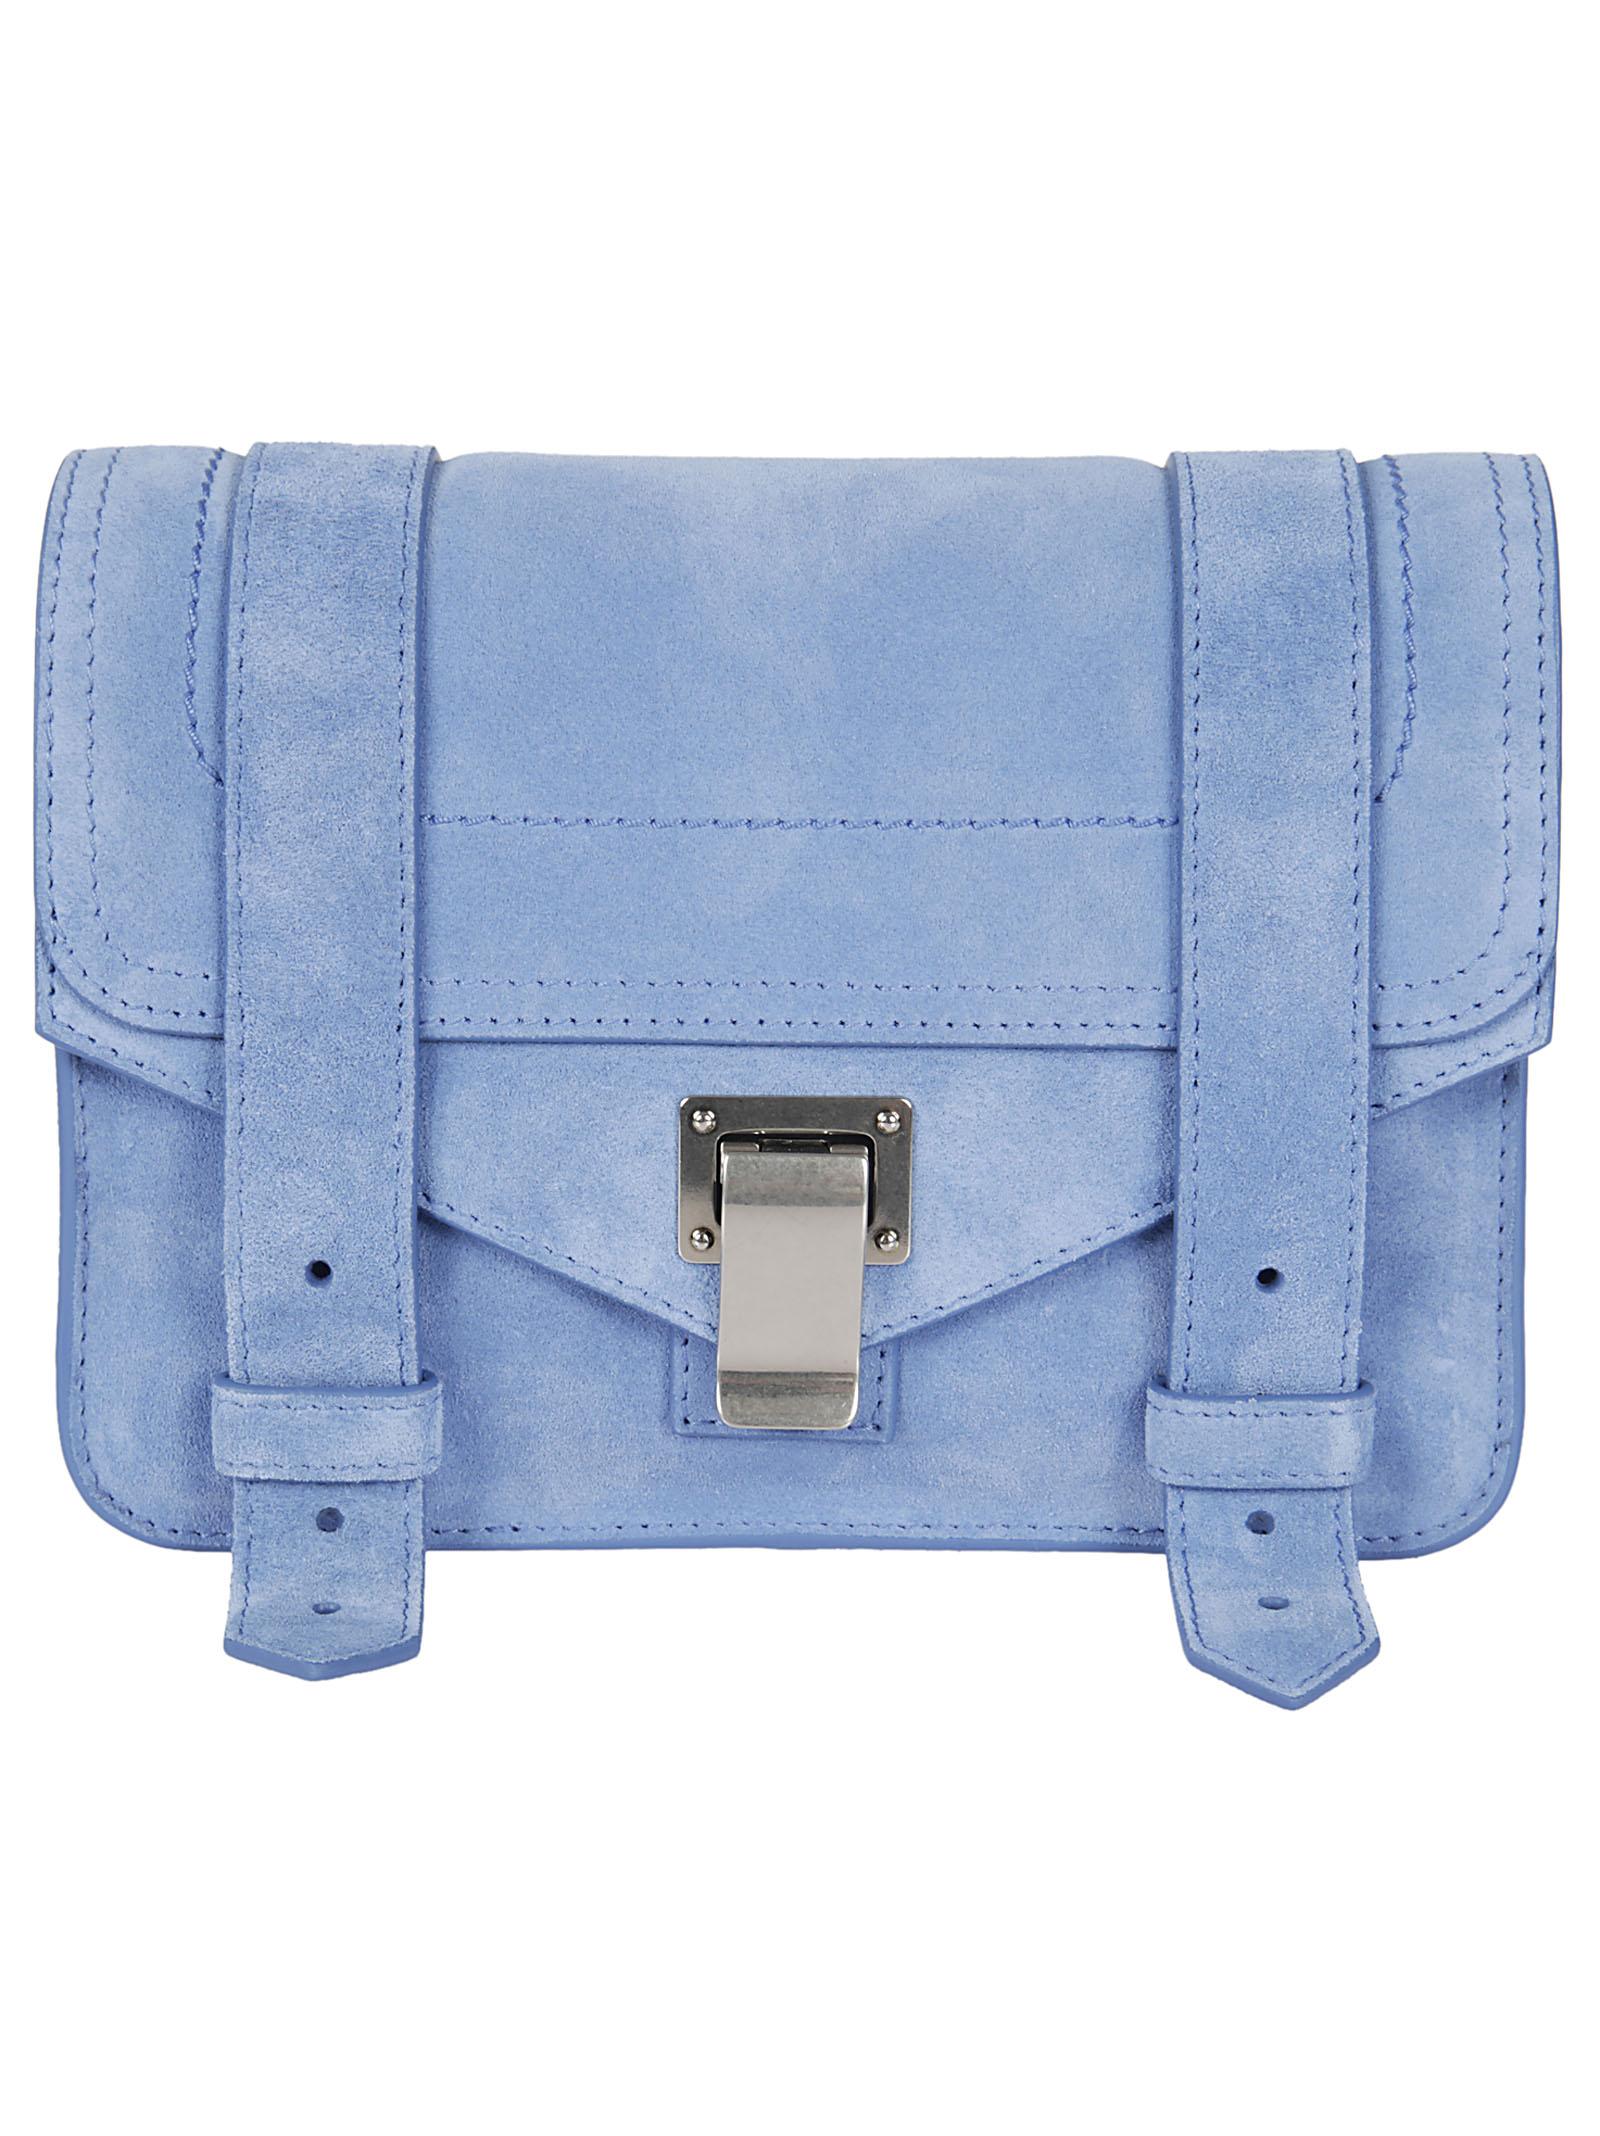 Proenza Schouler Proenza Schouler PS1 Mini Shoulder Bag